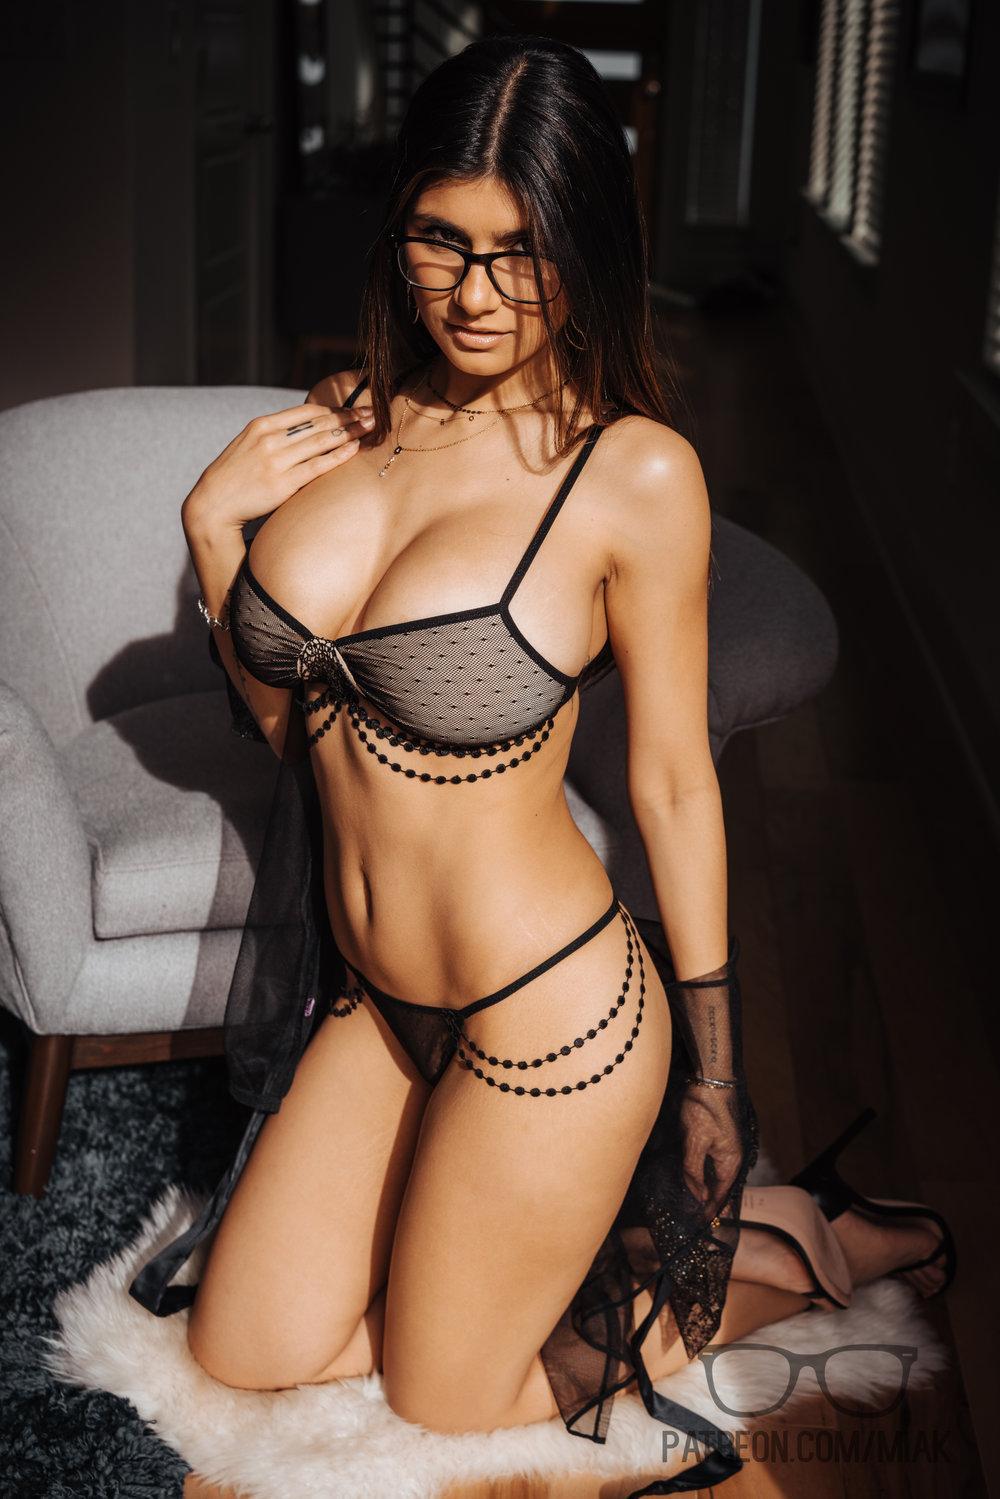 Mia Khalifa Lingerie Stiletto Heels Photoshoot Leaked 0002